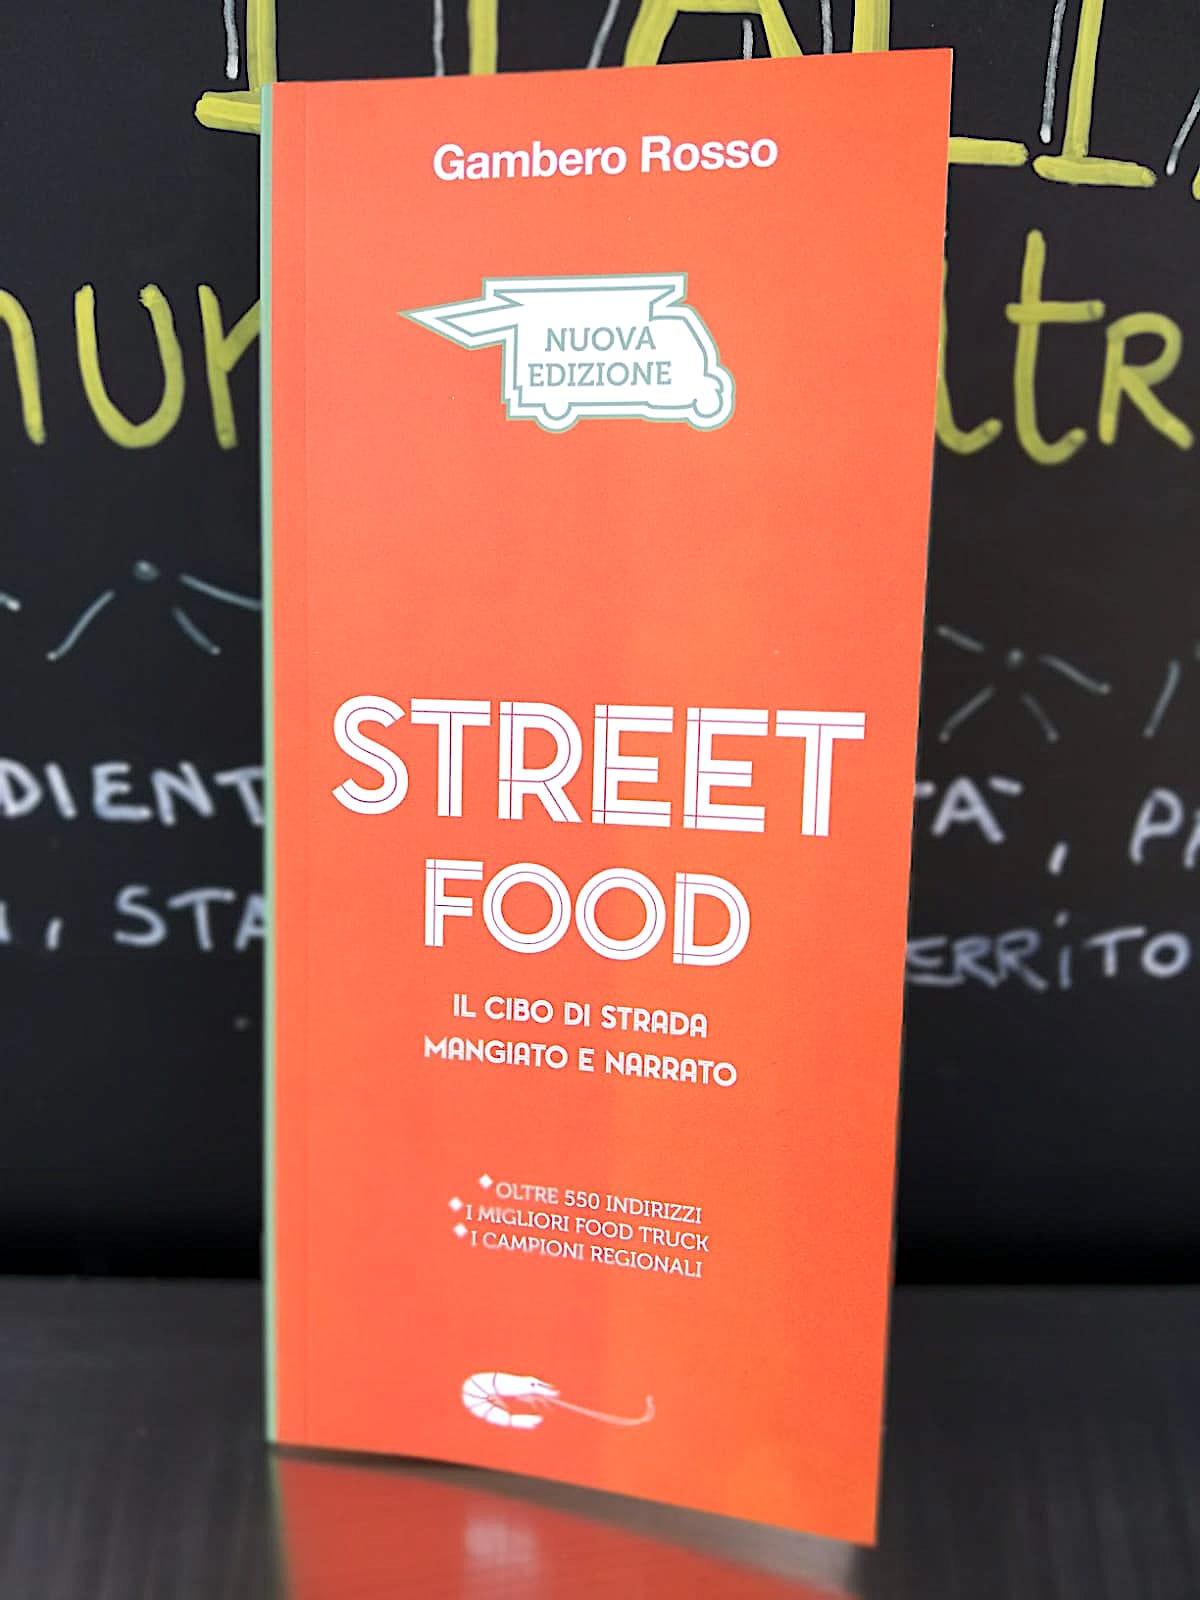 GAMBERO ROSSO NURA INDINA FOOD TRUCK FIRENZE CIBO INDIANO GUIDA GAMBERO ROSSO STREET FOOD 2019.JPG